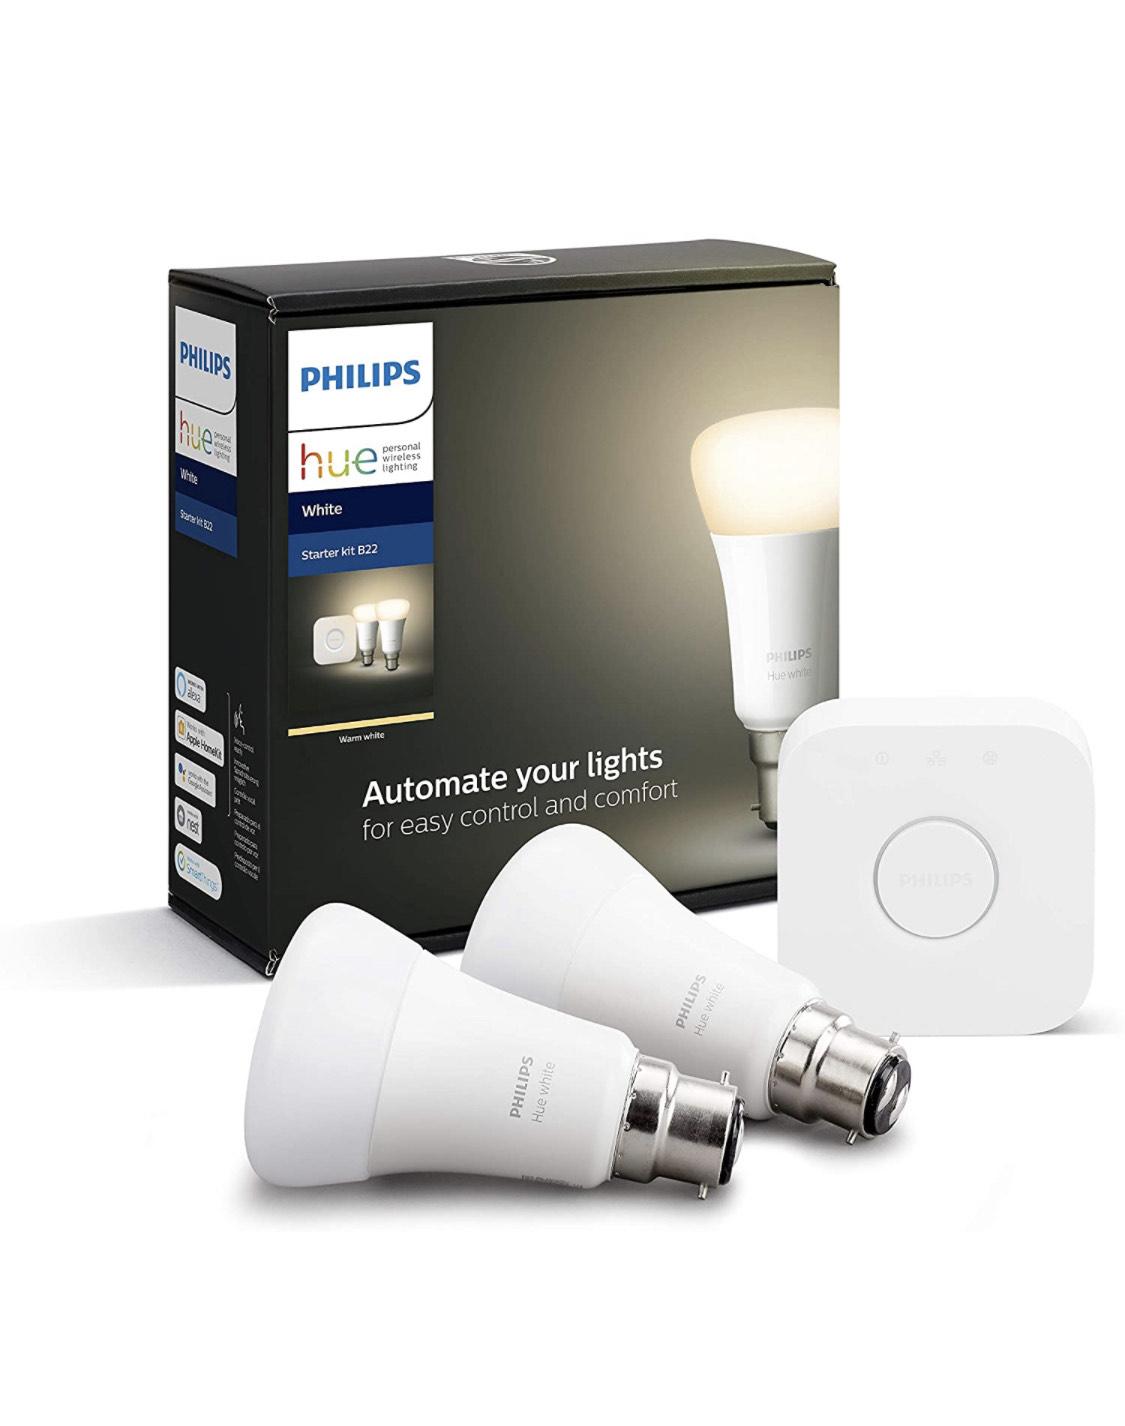 Philips Hue White Starter Kit: Smart Bulb Twin Pack LED [B22 Bayonet Cap] Including Bridge £28.75 Amazon